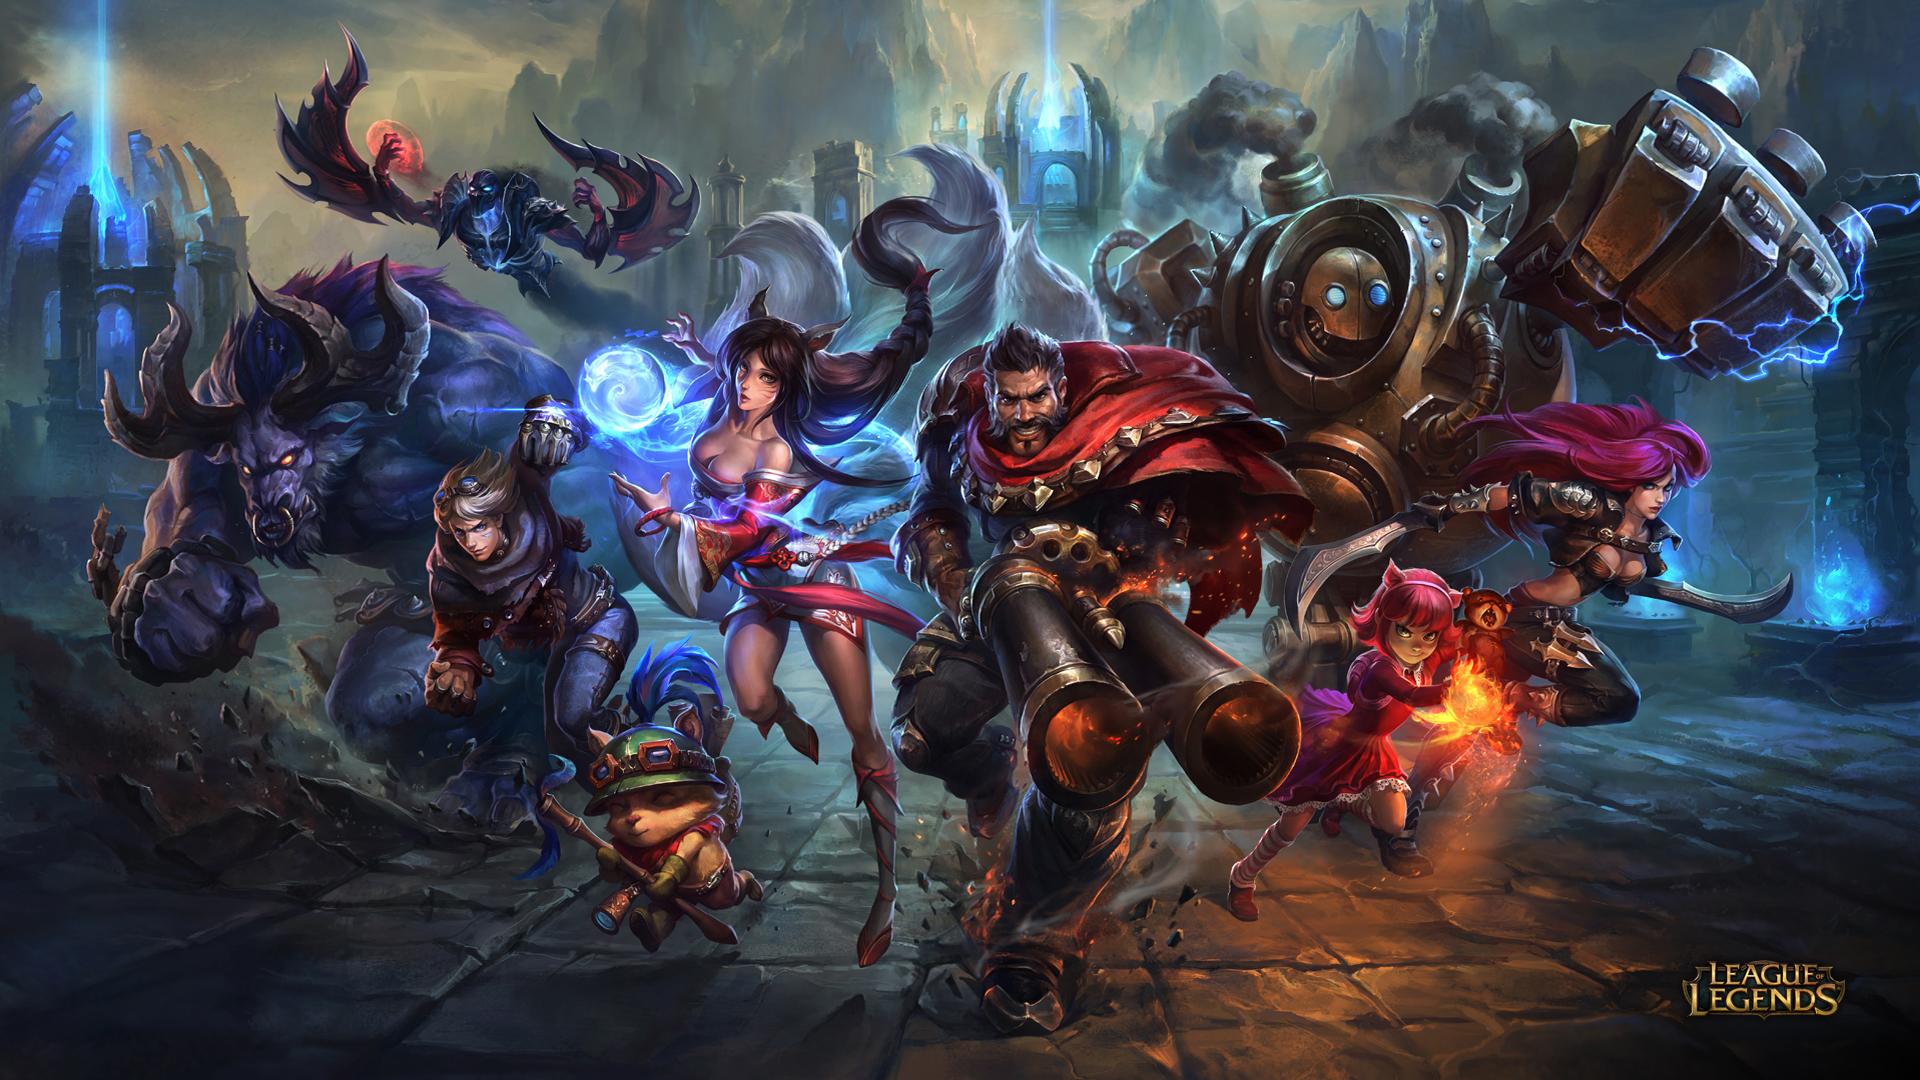 League of Legends wallpaper | SiliconANGLE